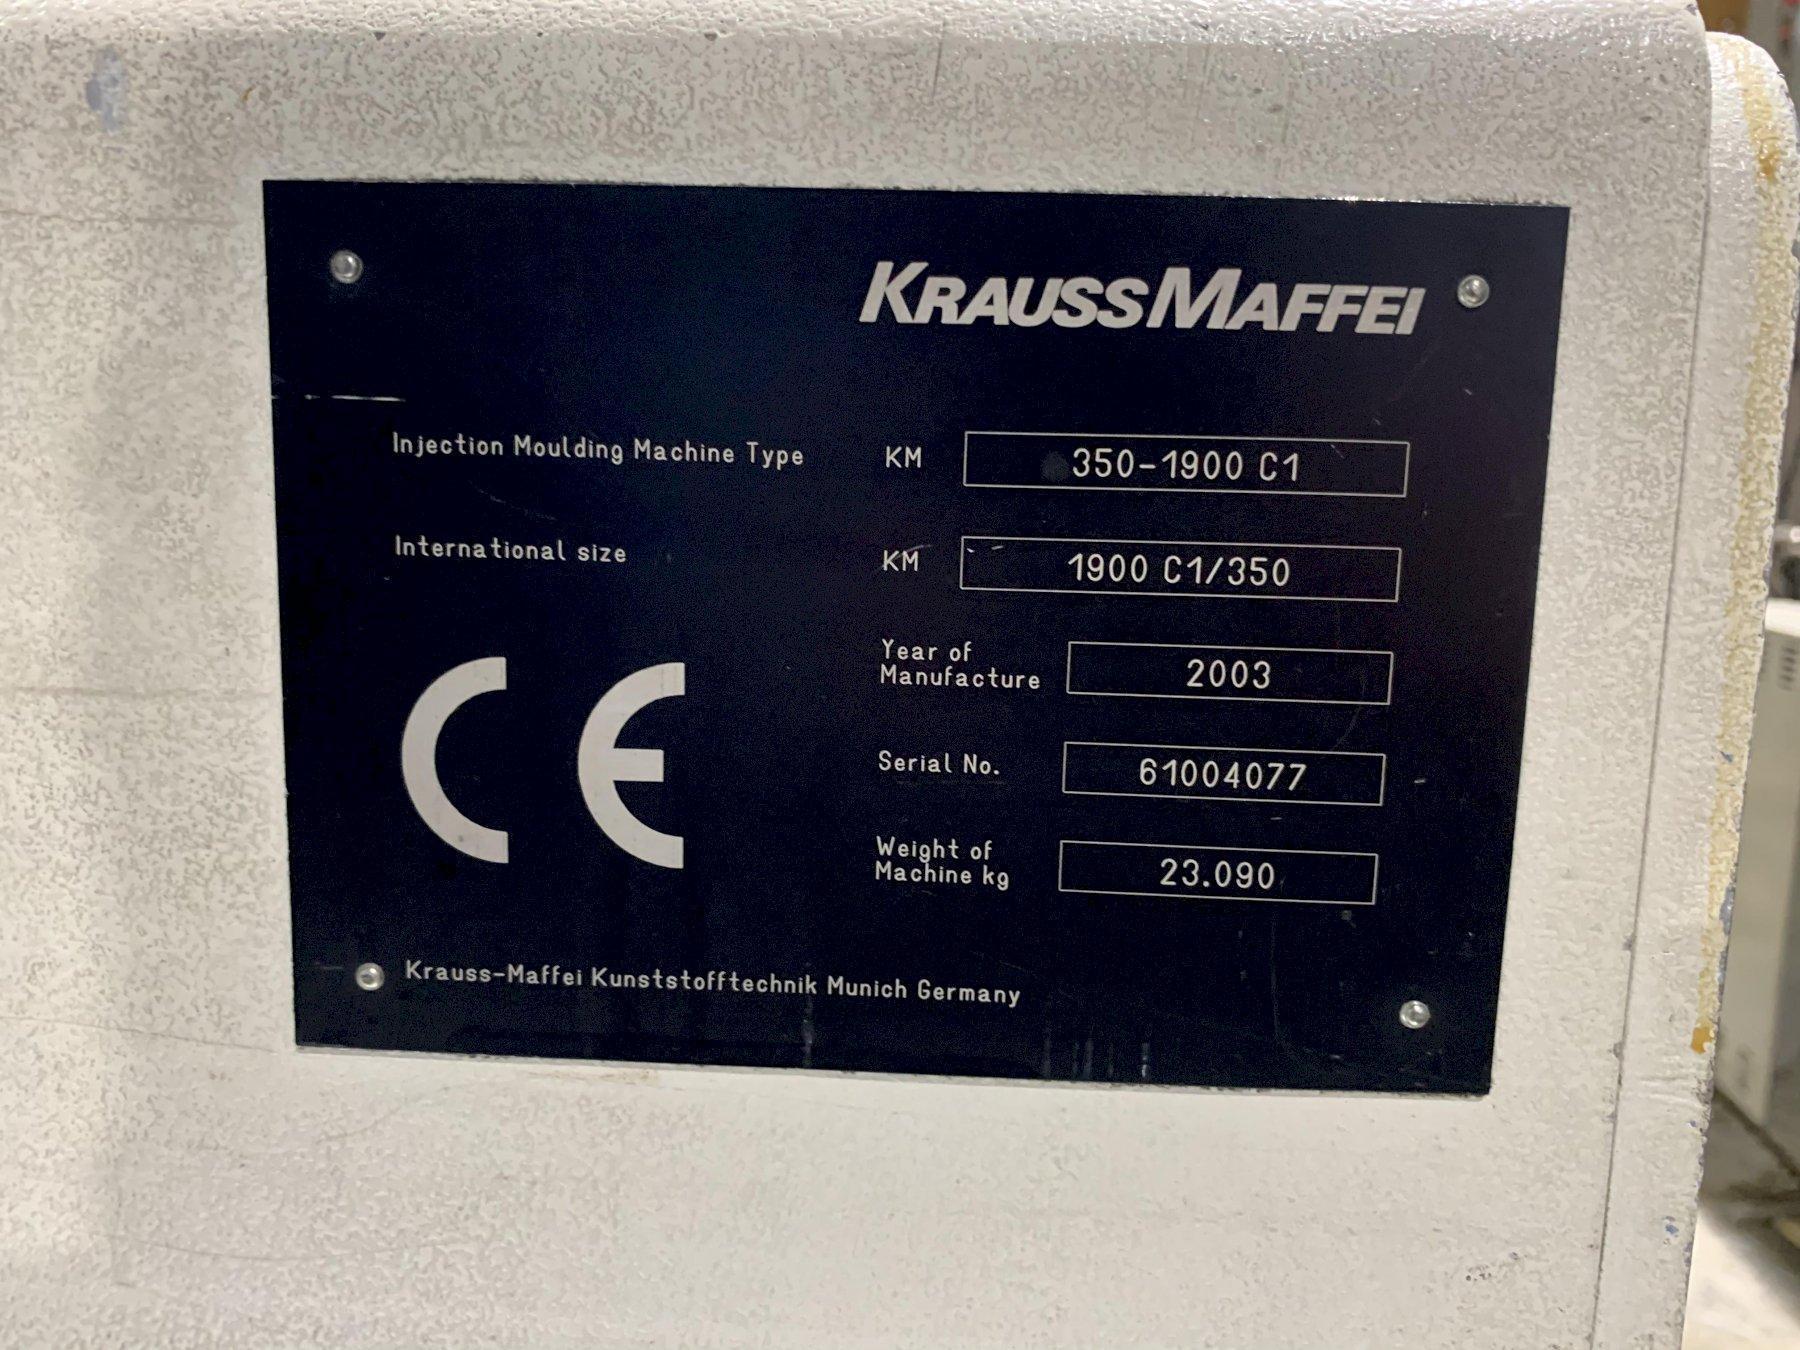 Krauss Maffei Used 350-1900 C1 Injection Molding Machine, 350 US ton, Yr 2003, 35 oz.